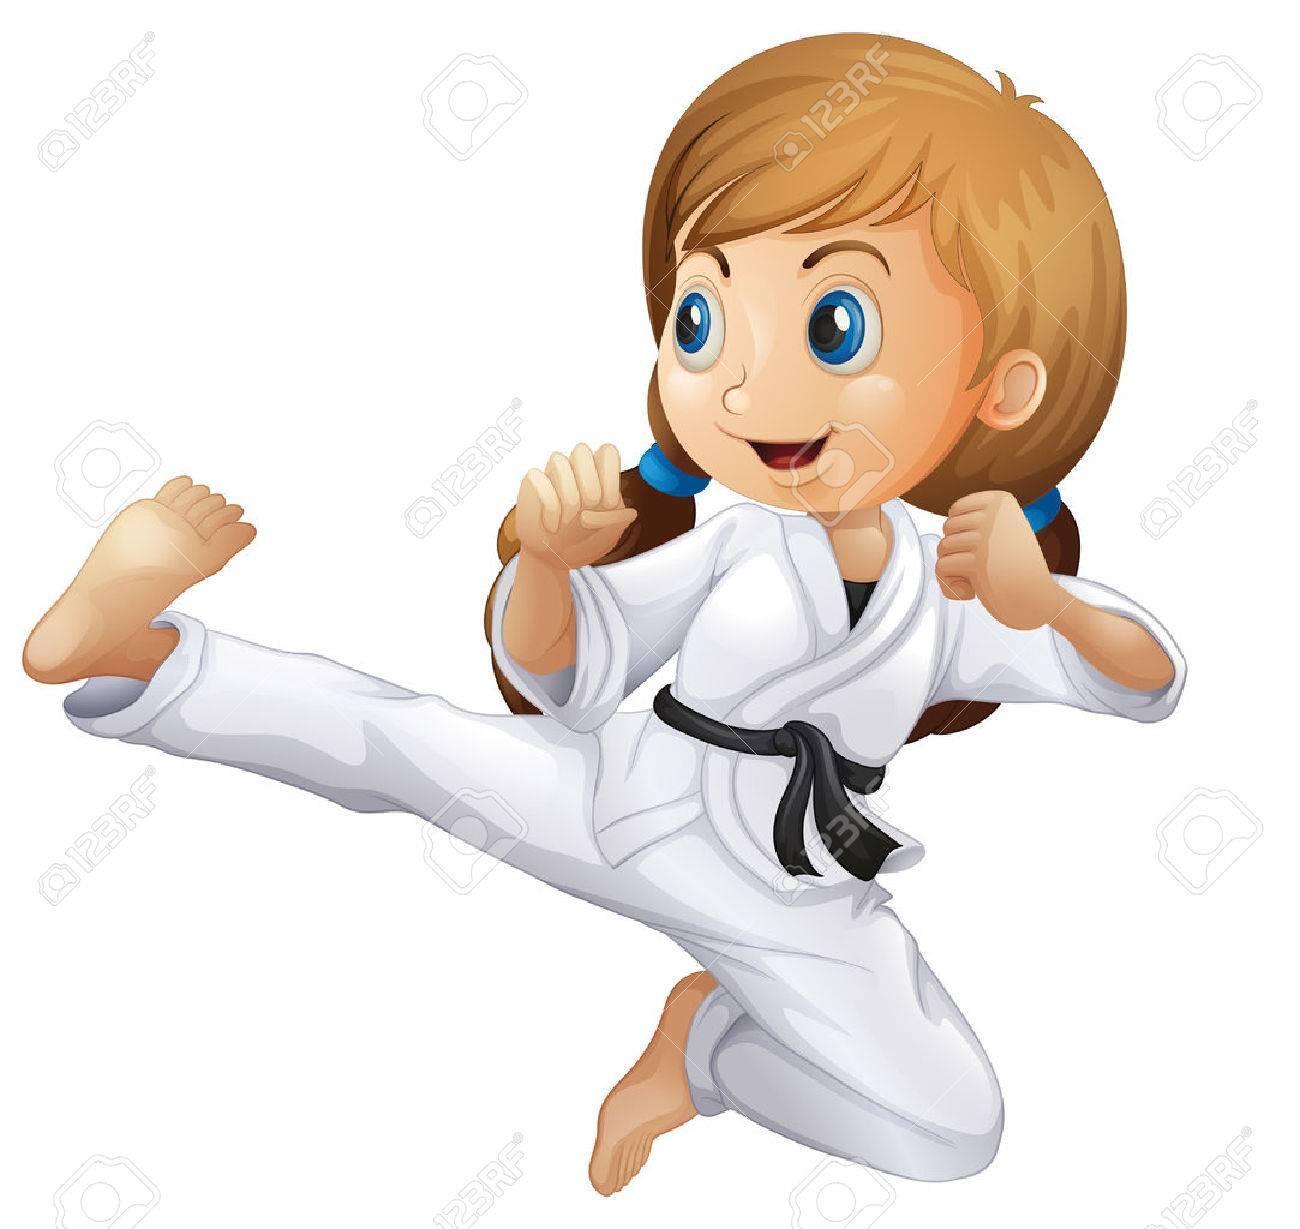 Girl karate clipart 5 » Clipart Portal.